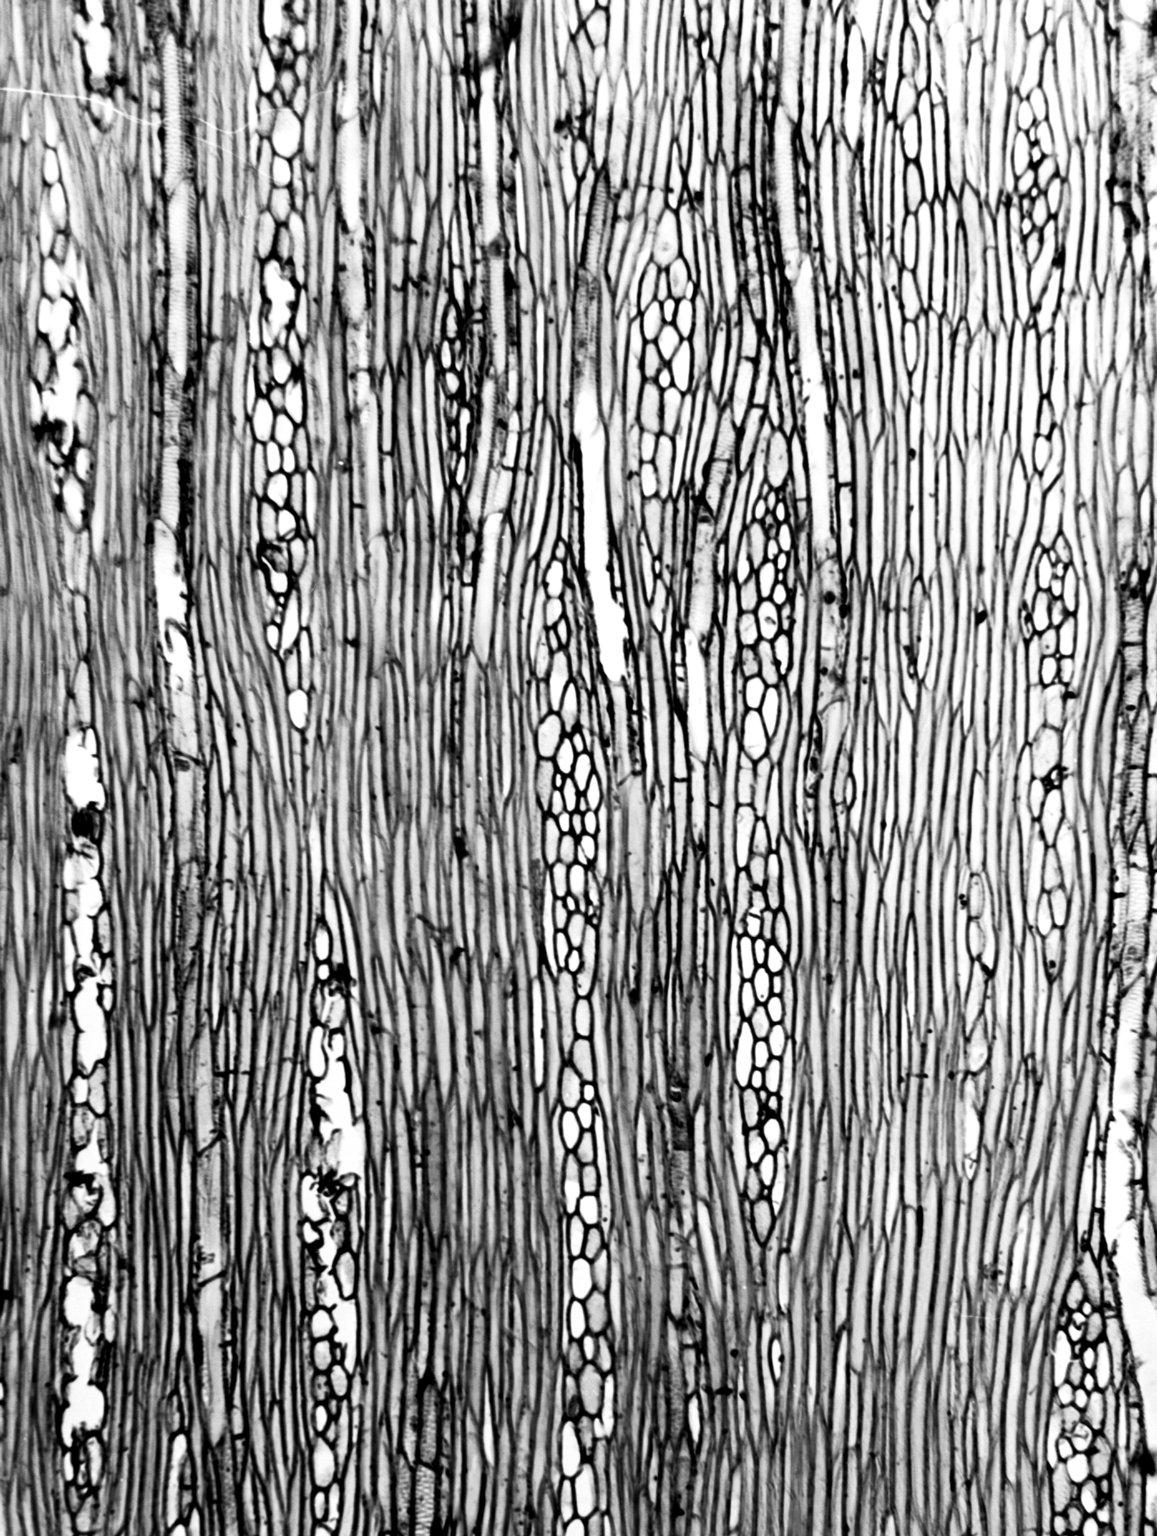 ASTERACEAE Taeckholmia pinnata